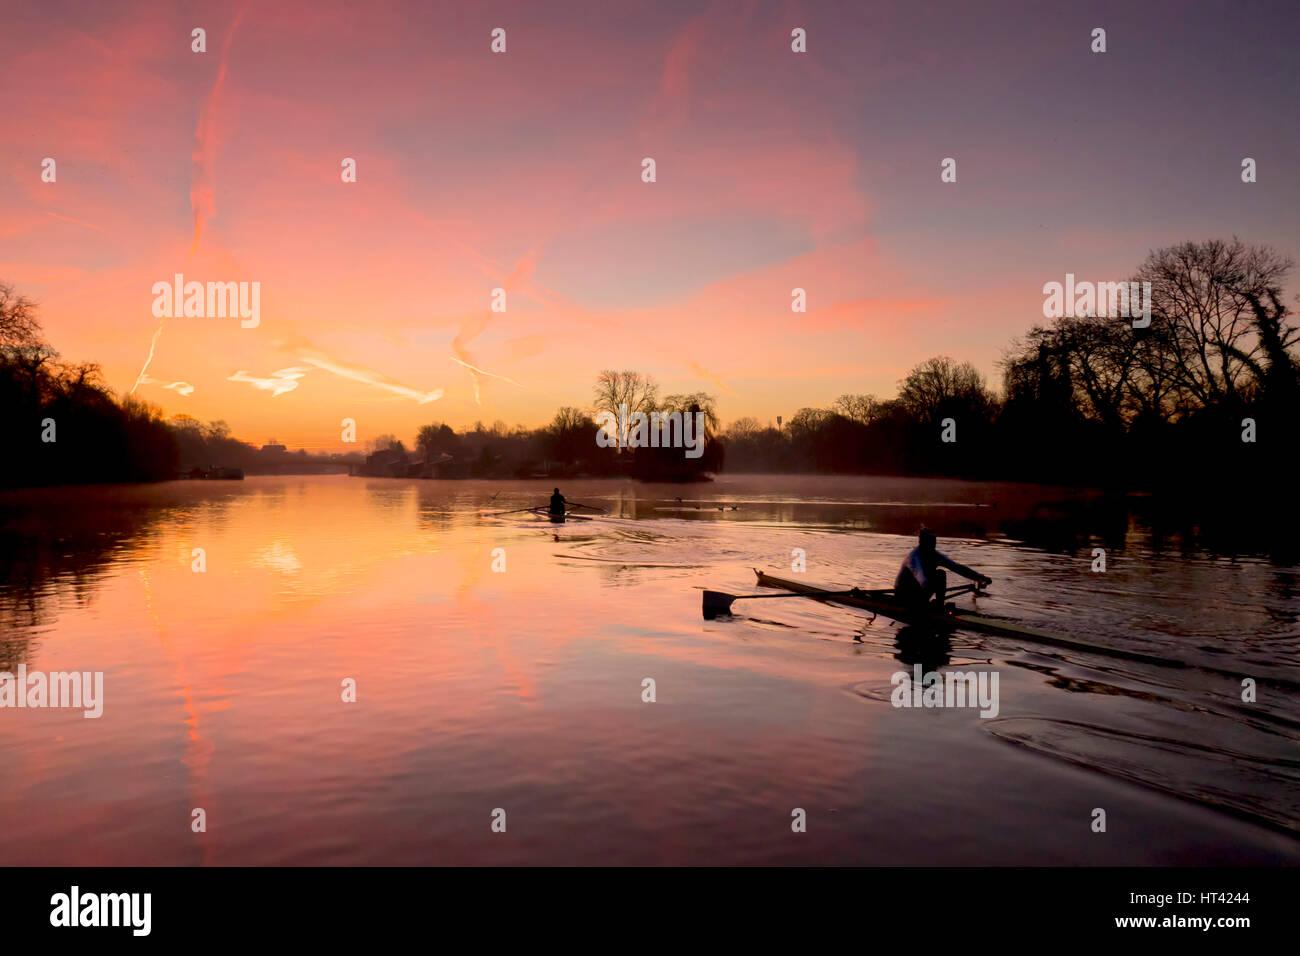 Sculling at sunrise - Stock Image